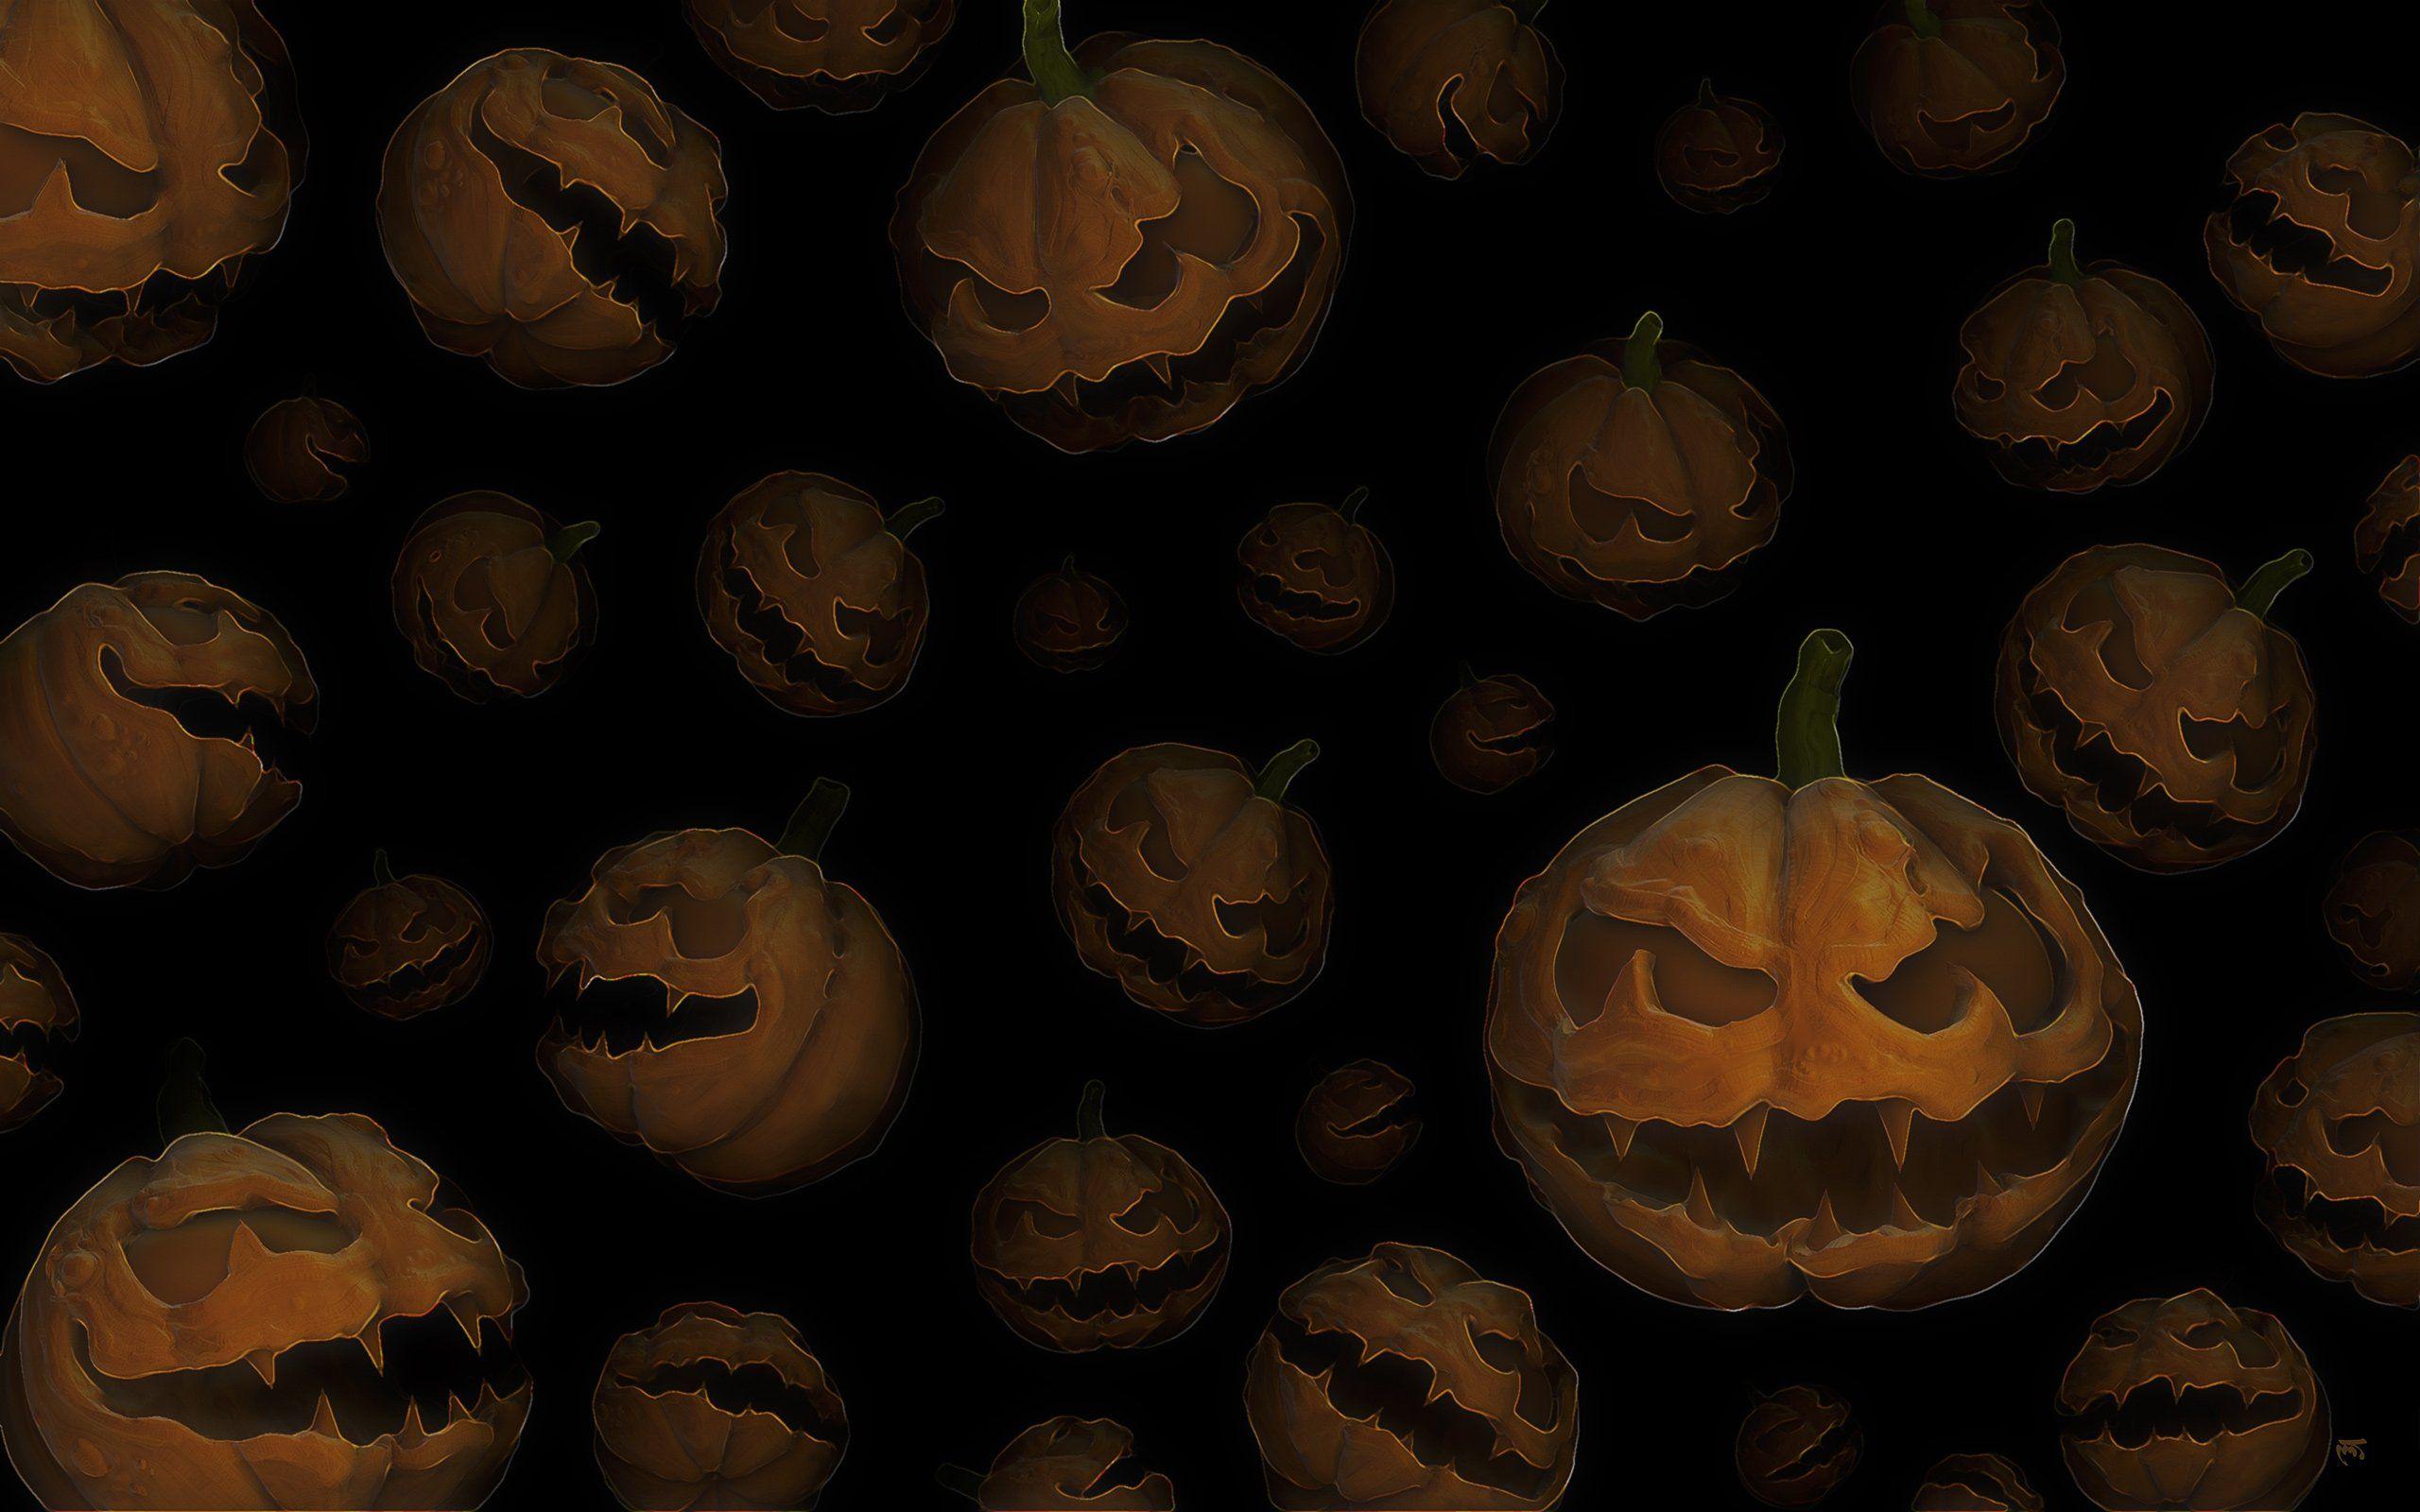 Scary Halloween Wallpaper Tumblr